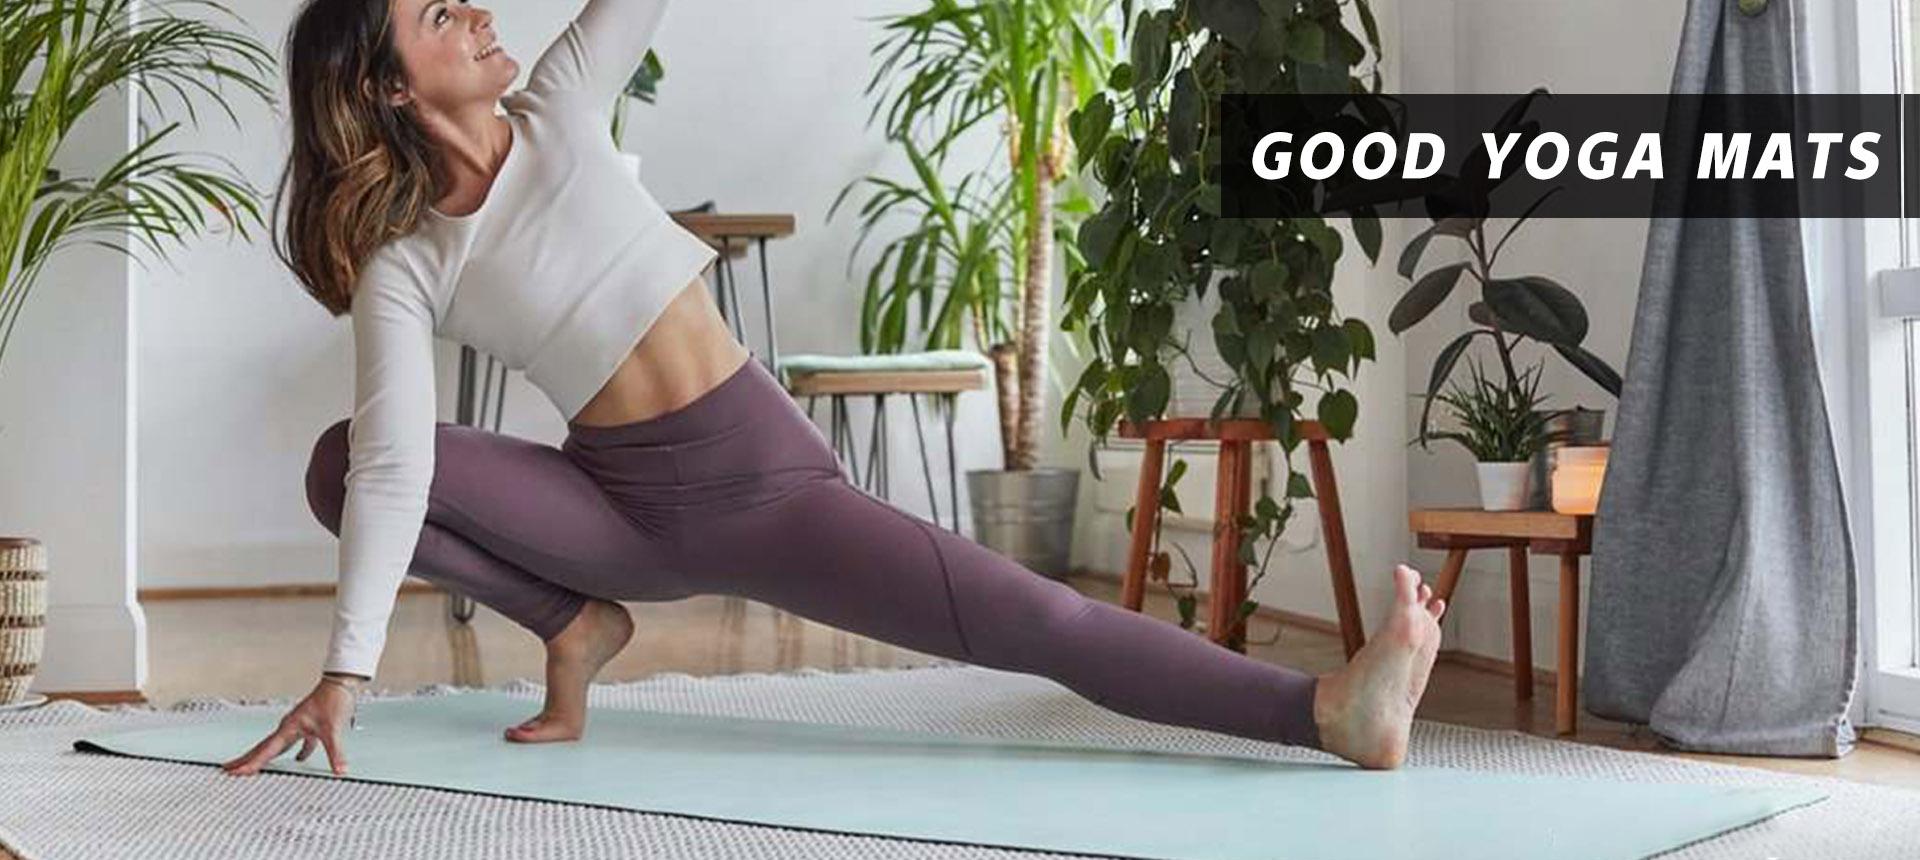 Good-Yoga-Mats